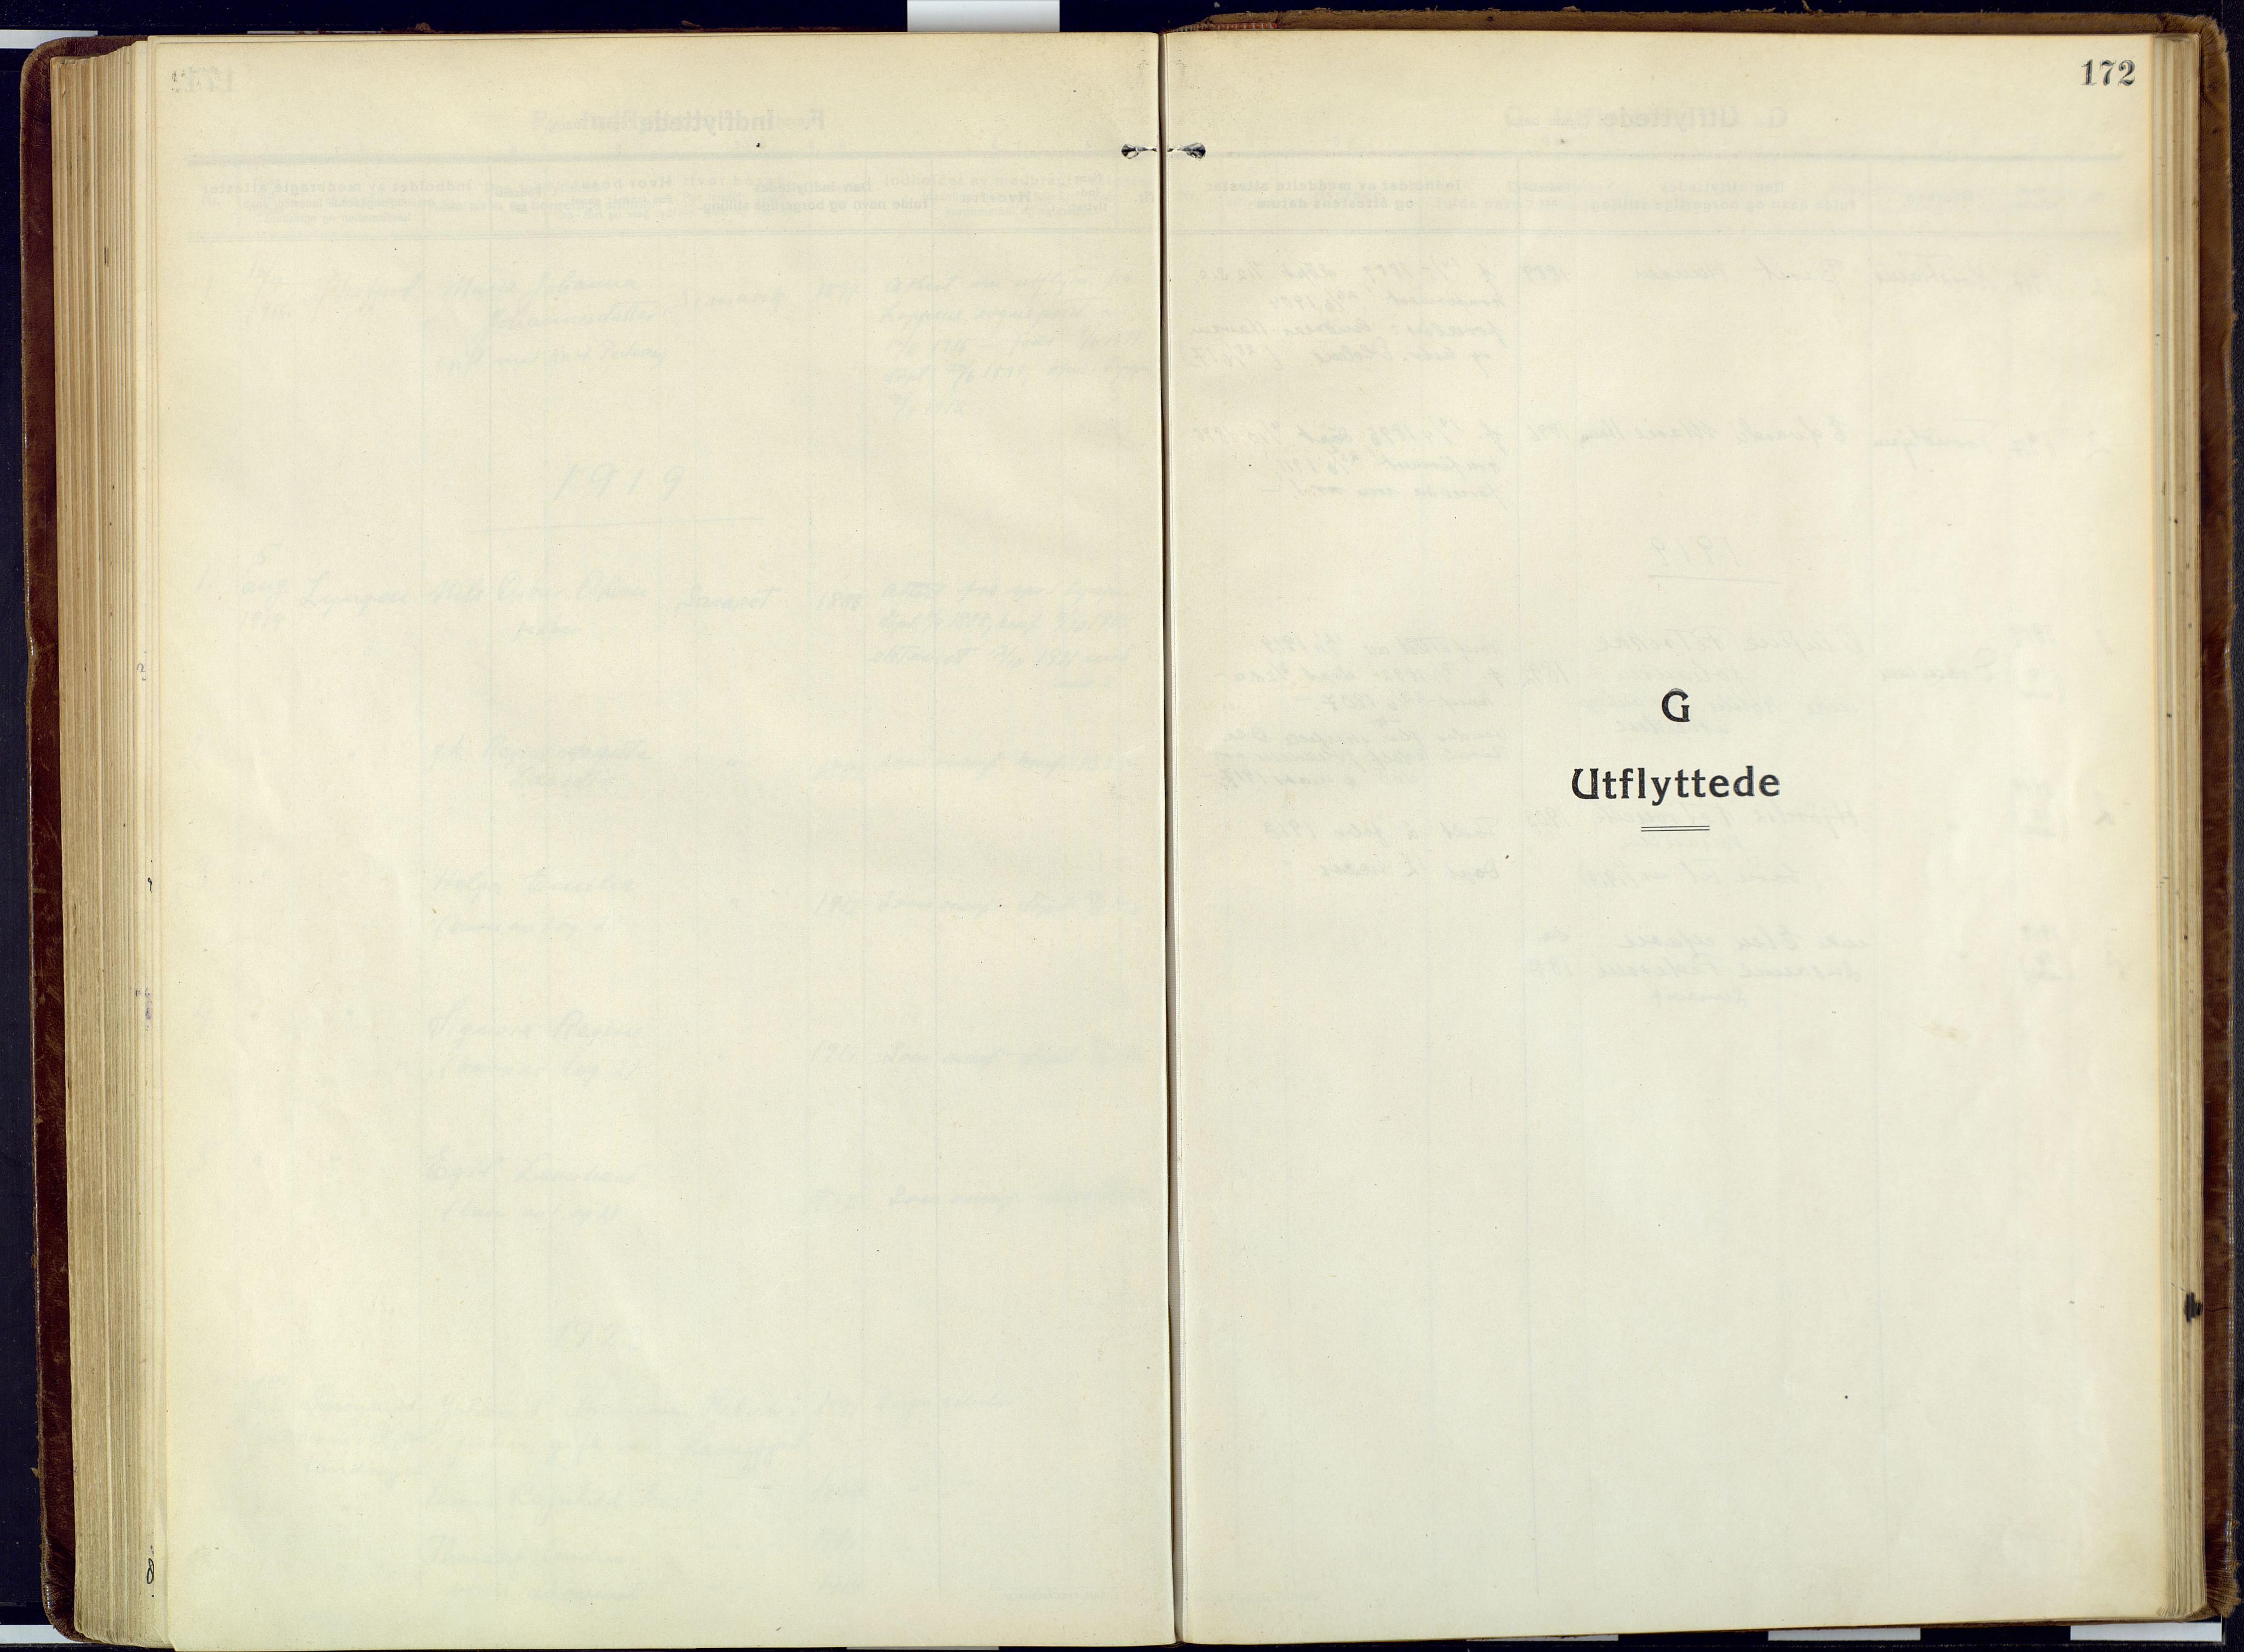 SATØ, Talvik sokneprestkontor, H/Ha/L0018kirke: Ministerialbok nr. 18, 1915-1924, s. 172